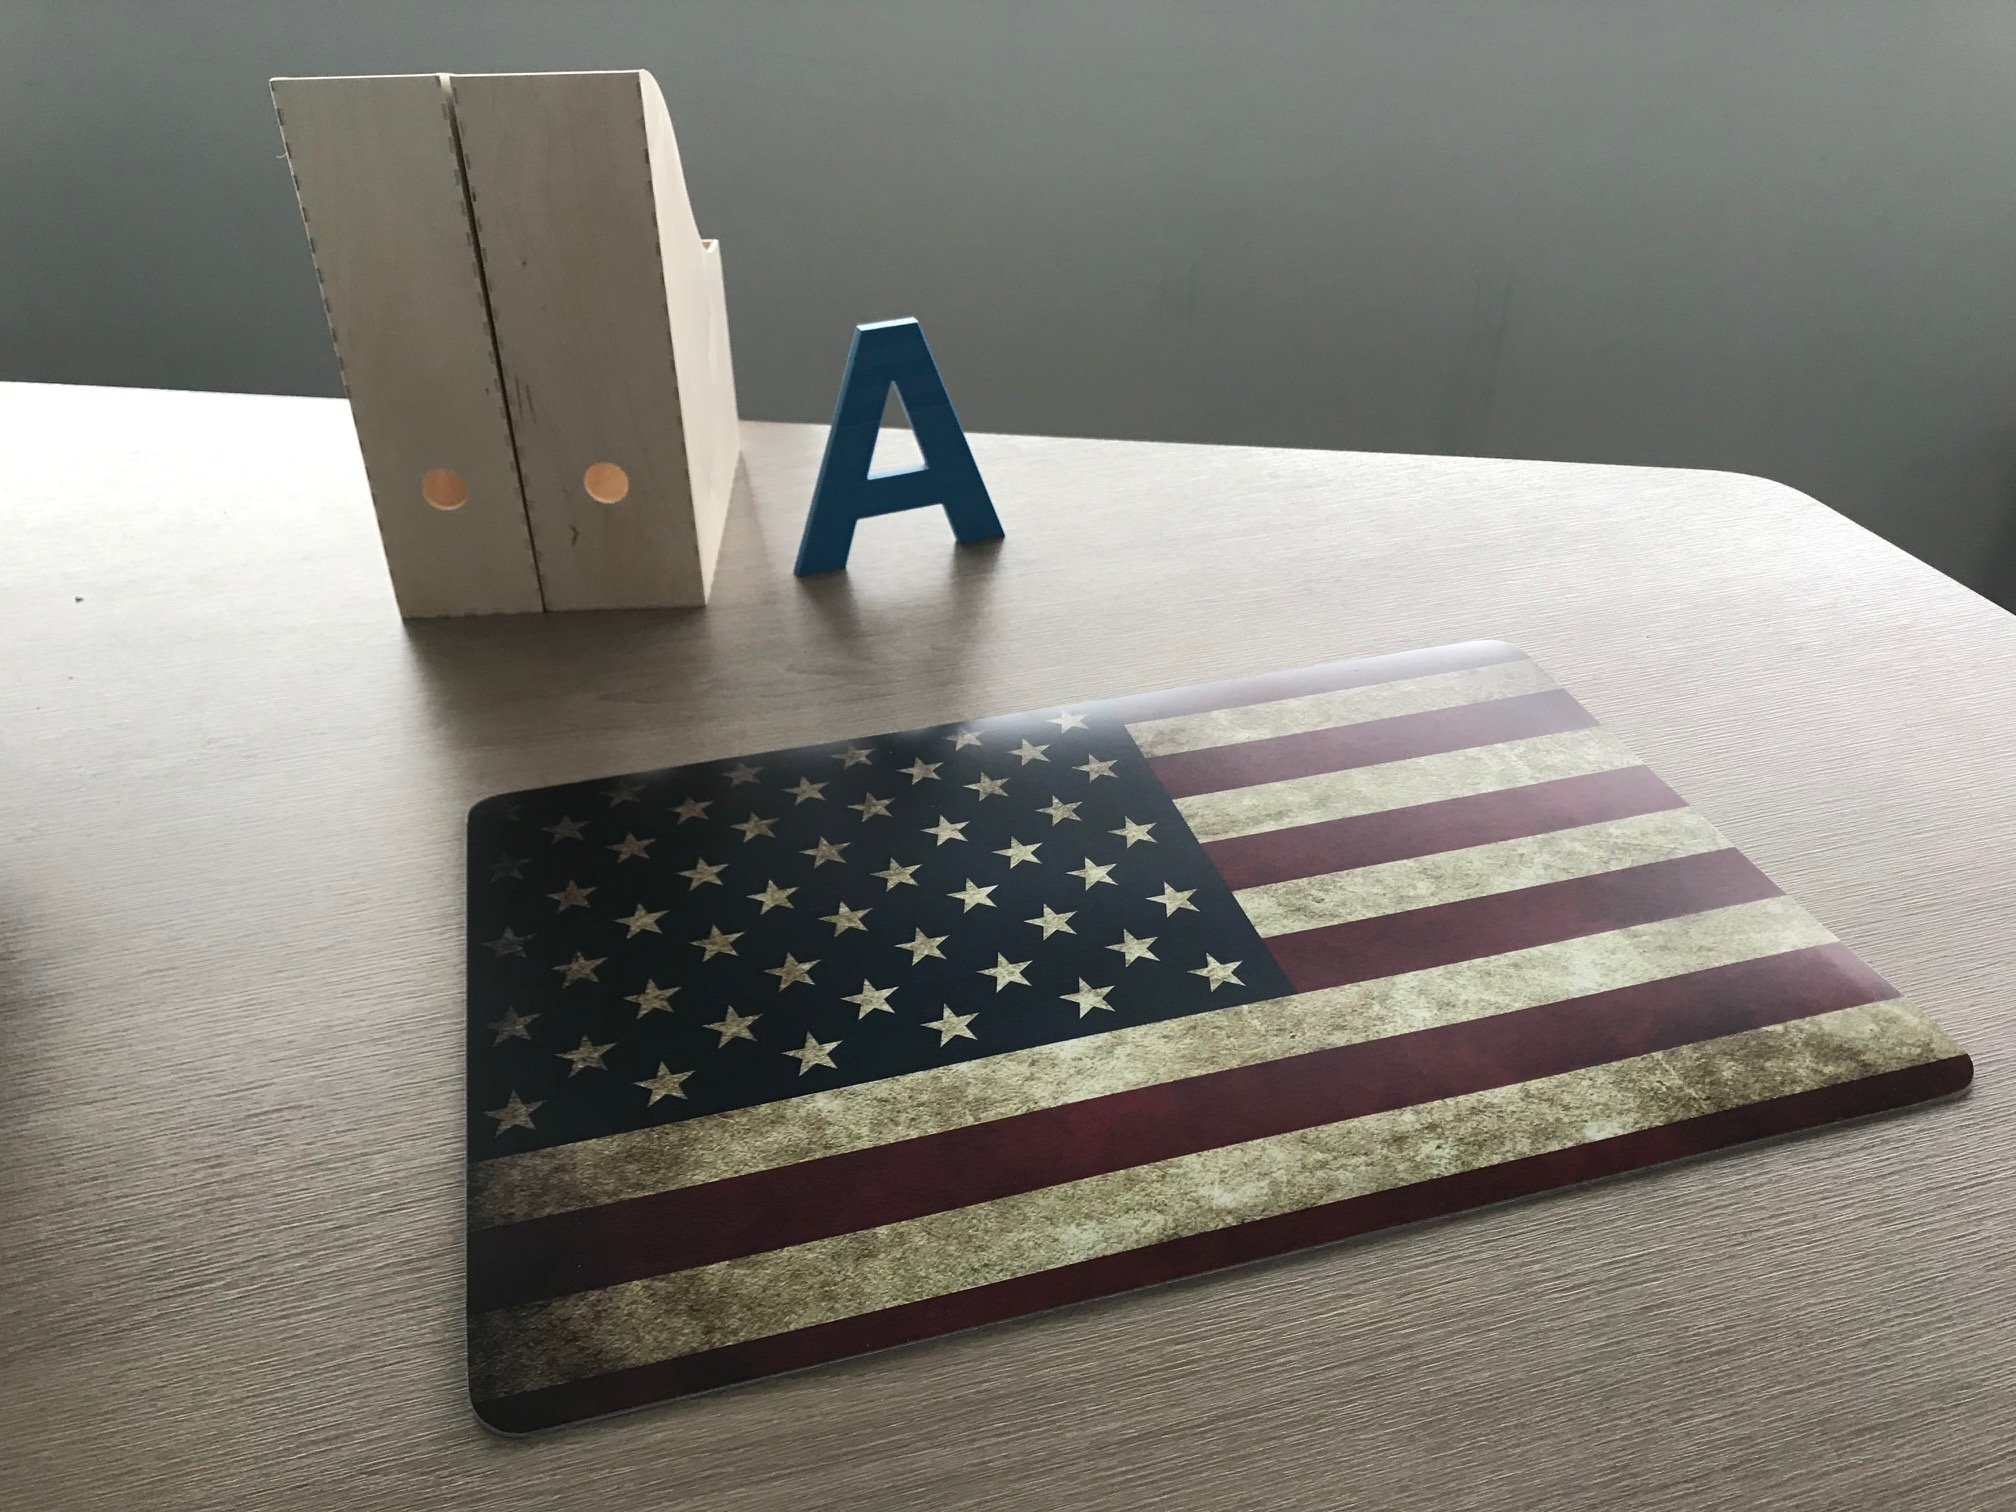 Een bureaulegger met de USA vlag